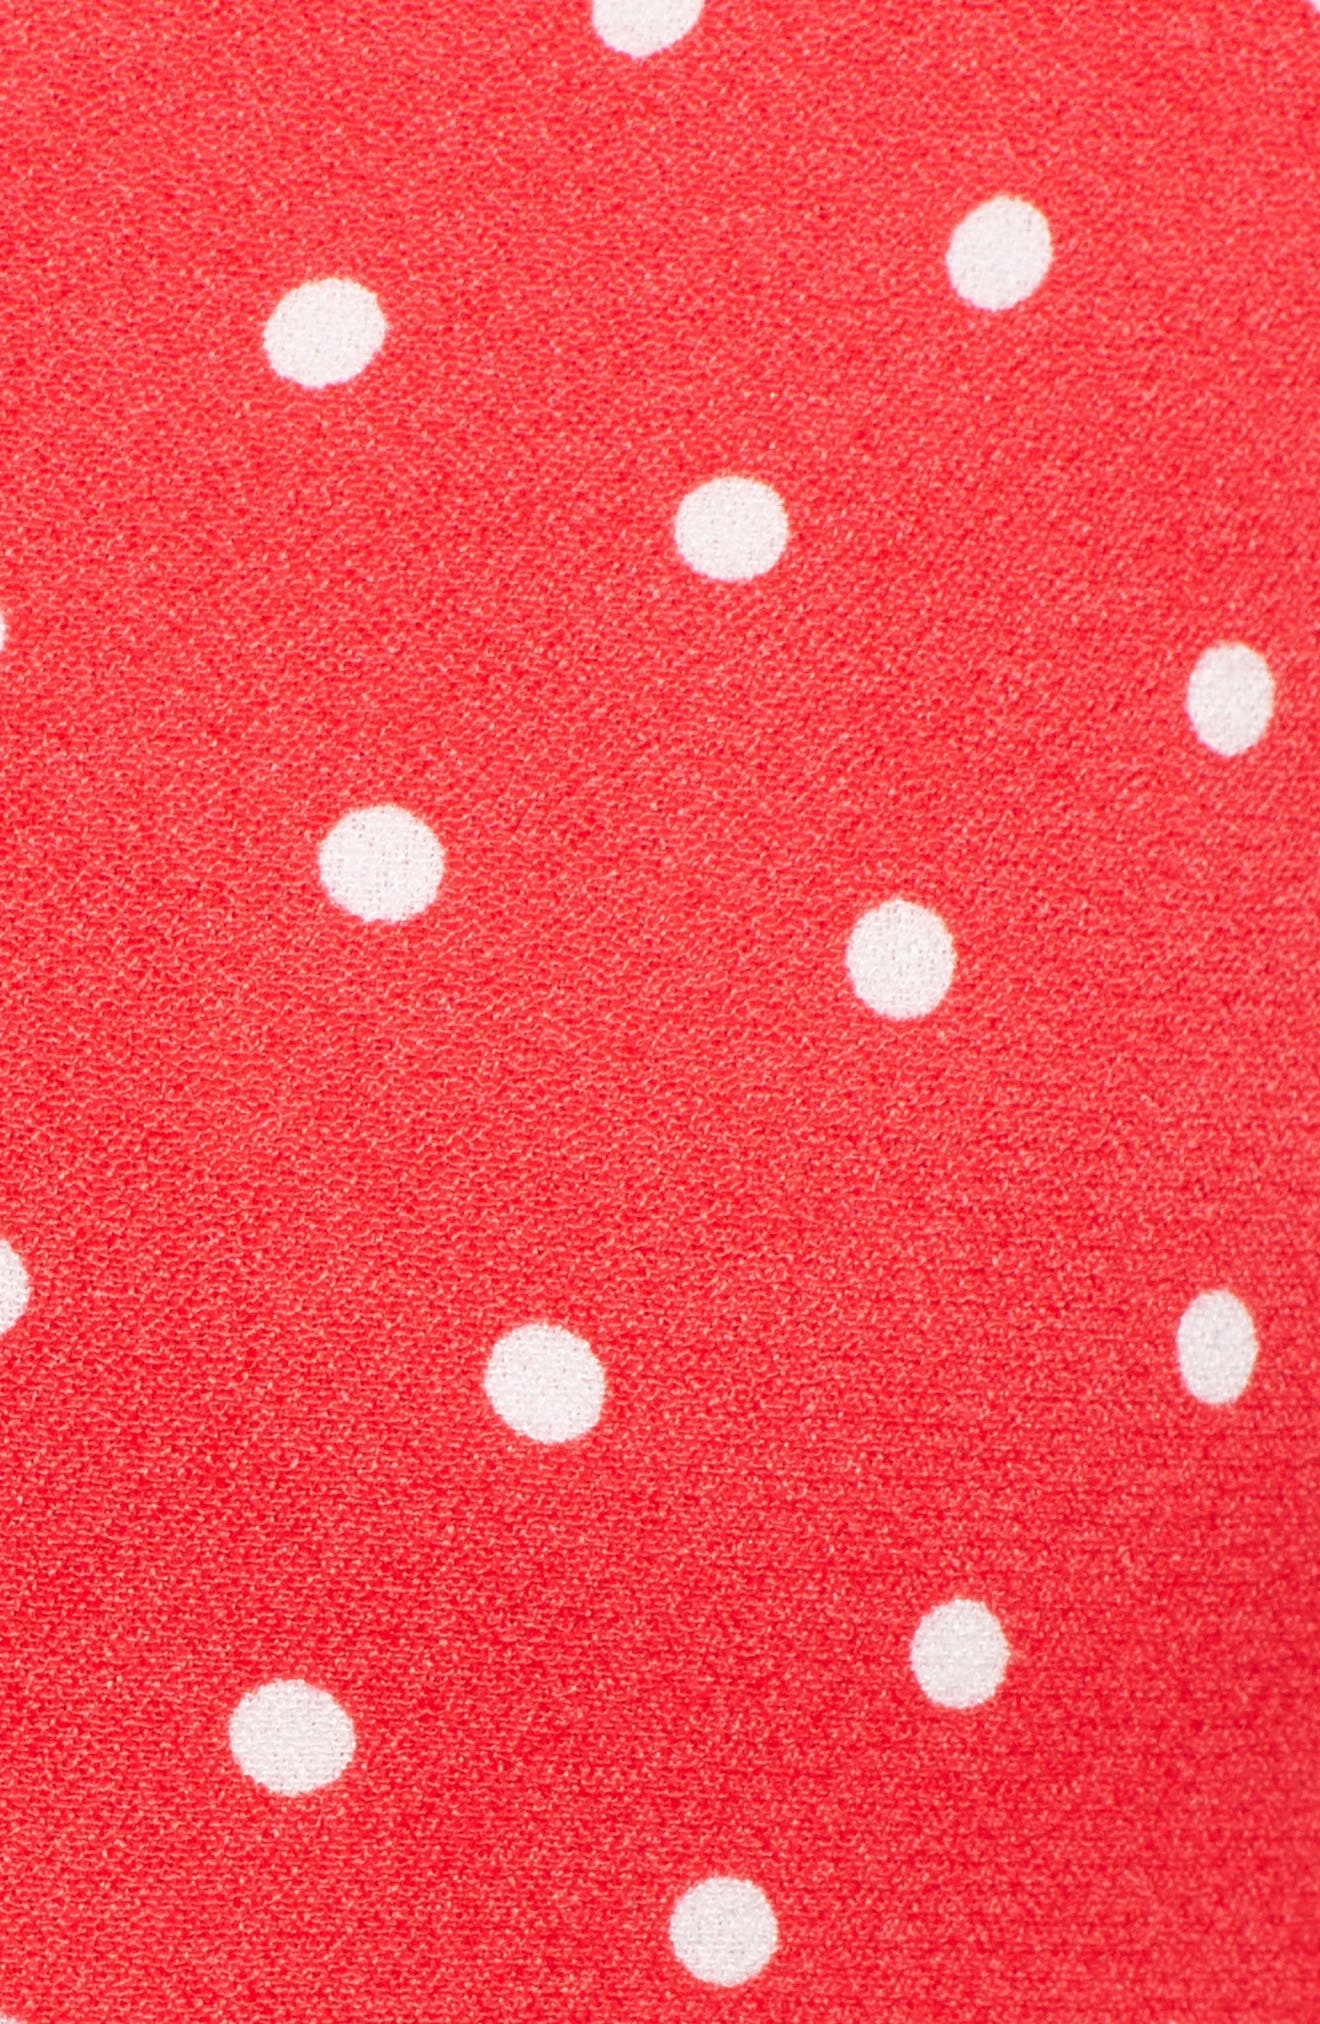 Kyla Crop Top,                             Alternate thumbnail 5, color,                             Red Polka Dot